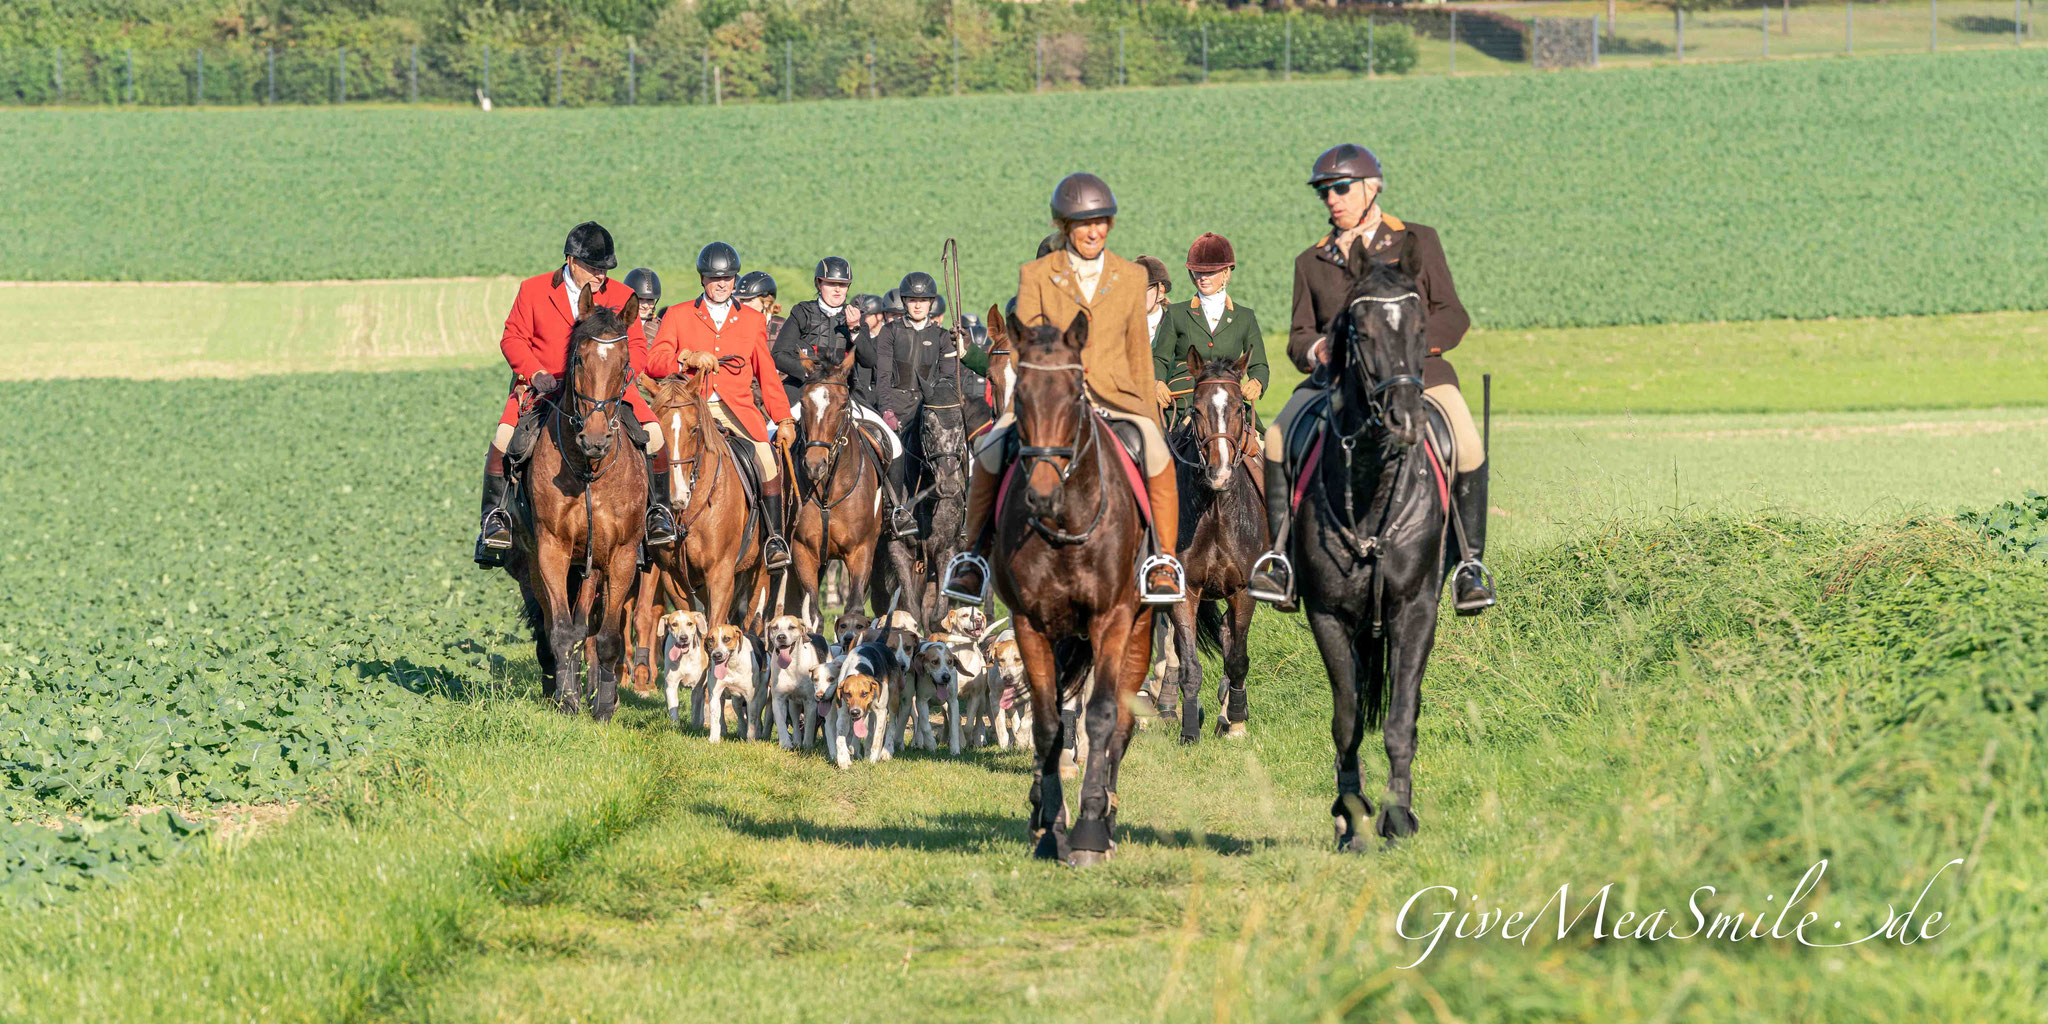 Jagdfotos vom Team @Givemeasmile.de auf der Fotojagd, Peter Jäger  #Melle #HofDettmer #Ostwestfalenmeute #givemeasmilede #foxhounds #beagles #jagdreiten #schleppjagd